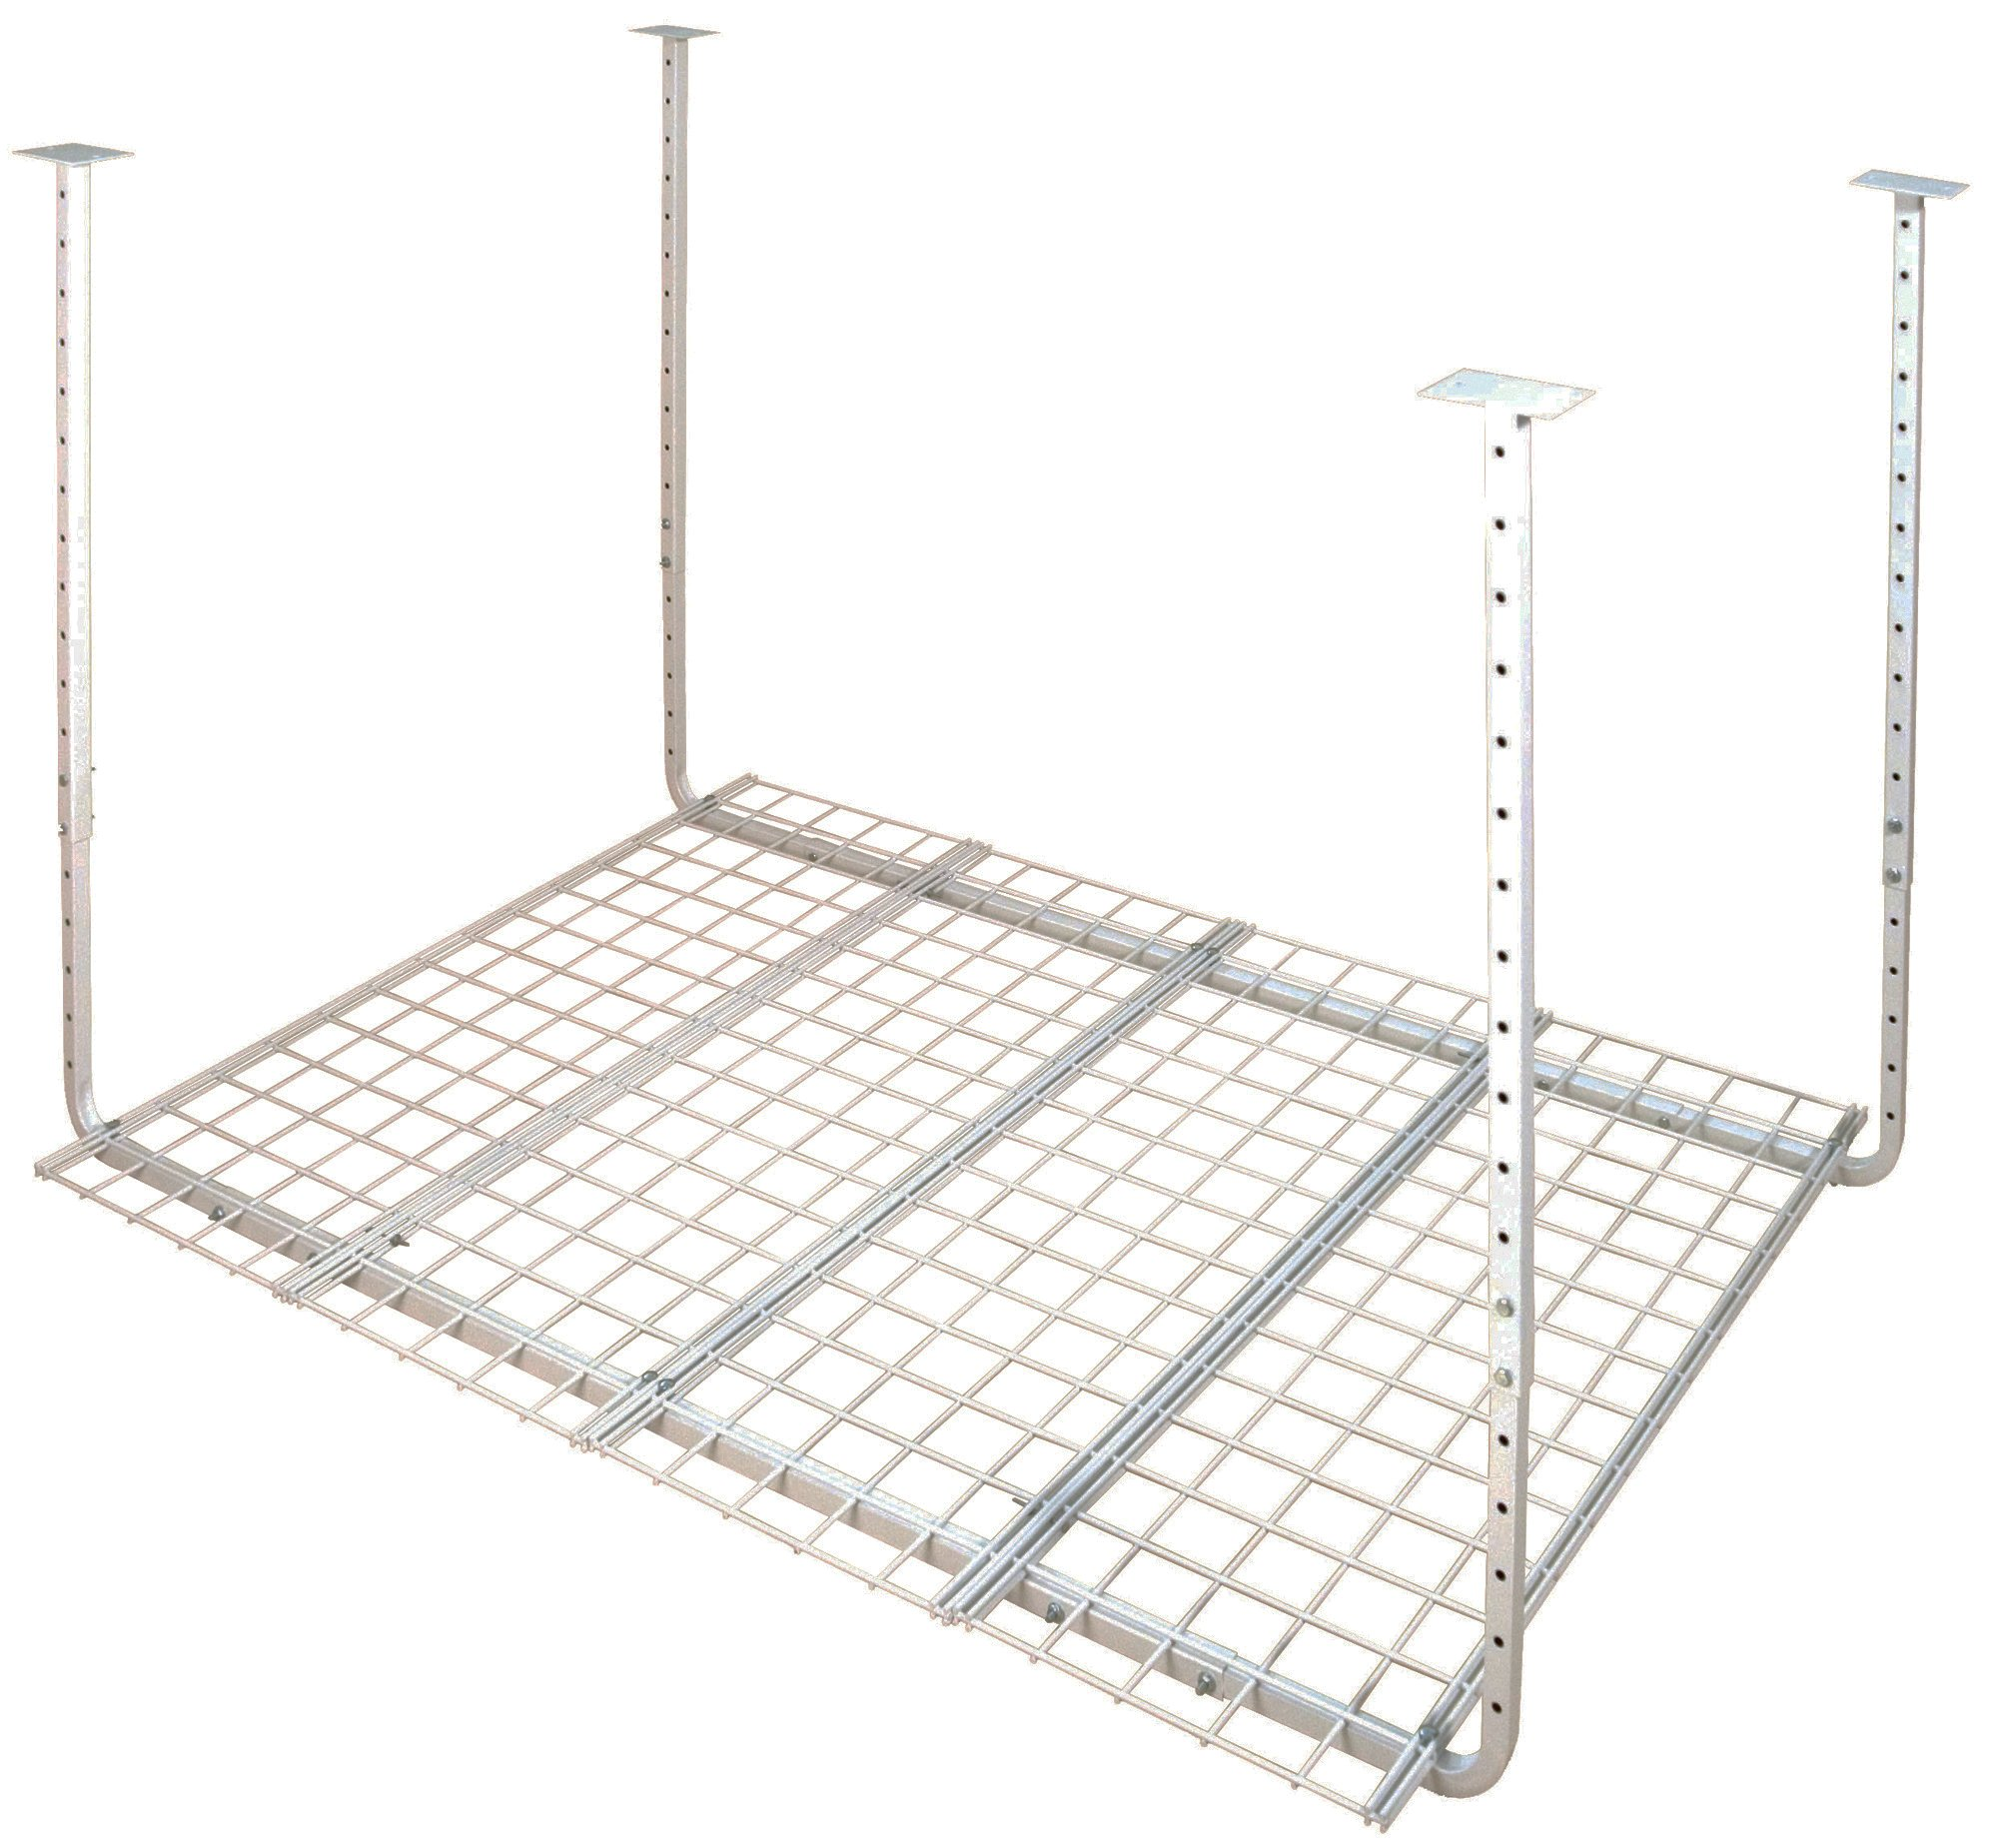 HyLoft 50175-10 60-Inch by 45-Inch Pro Ceiling Mount Shelf, White by HyLoft